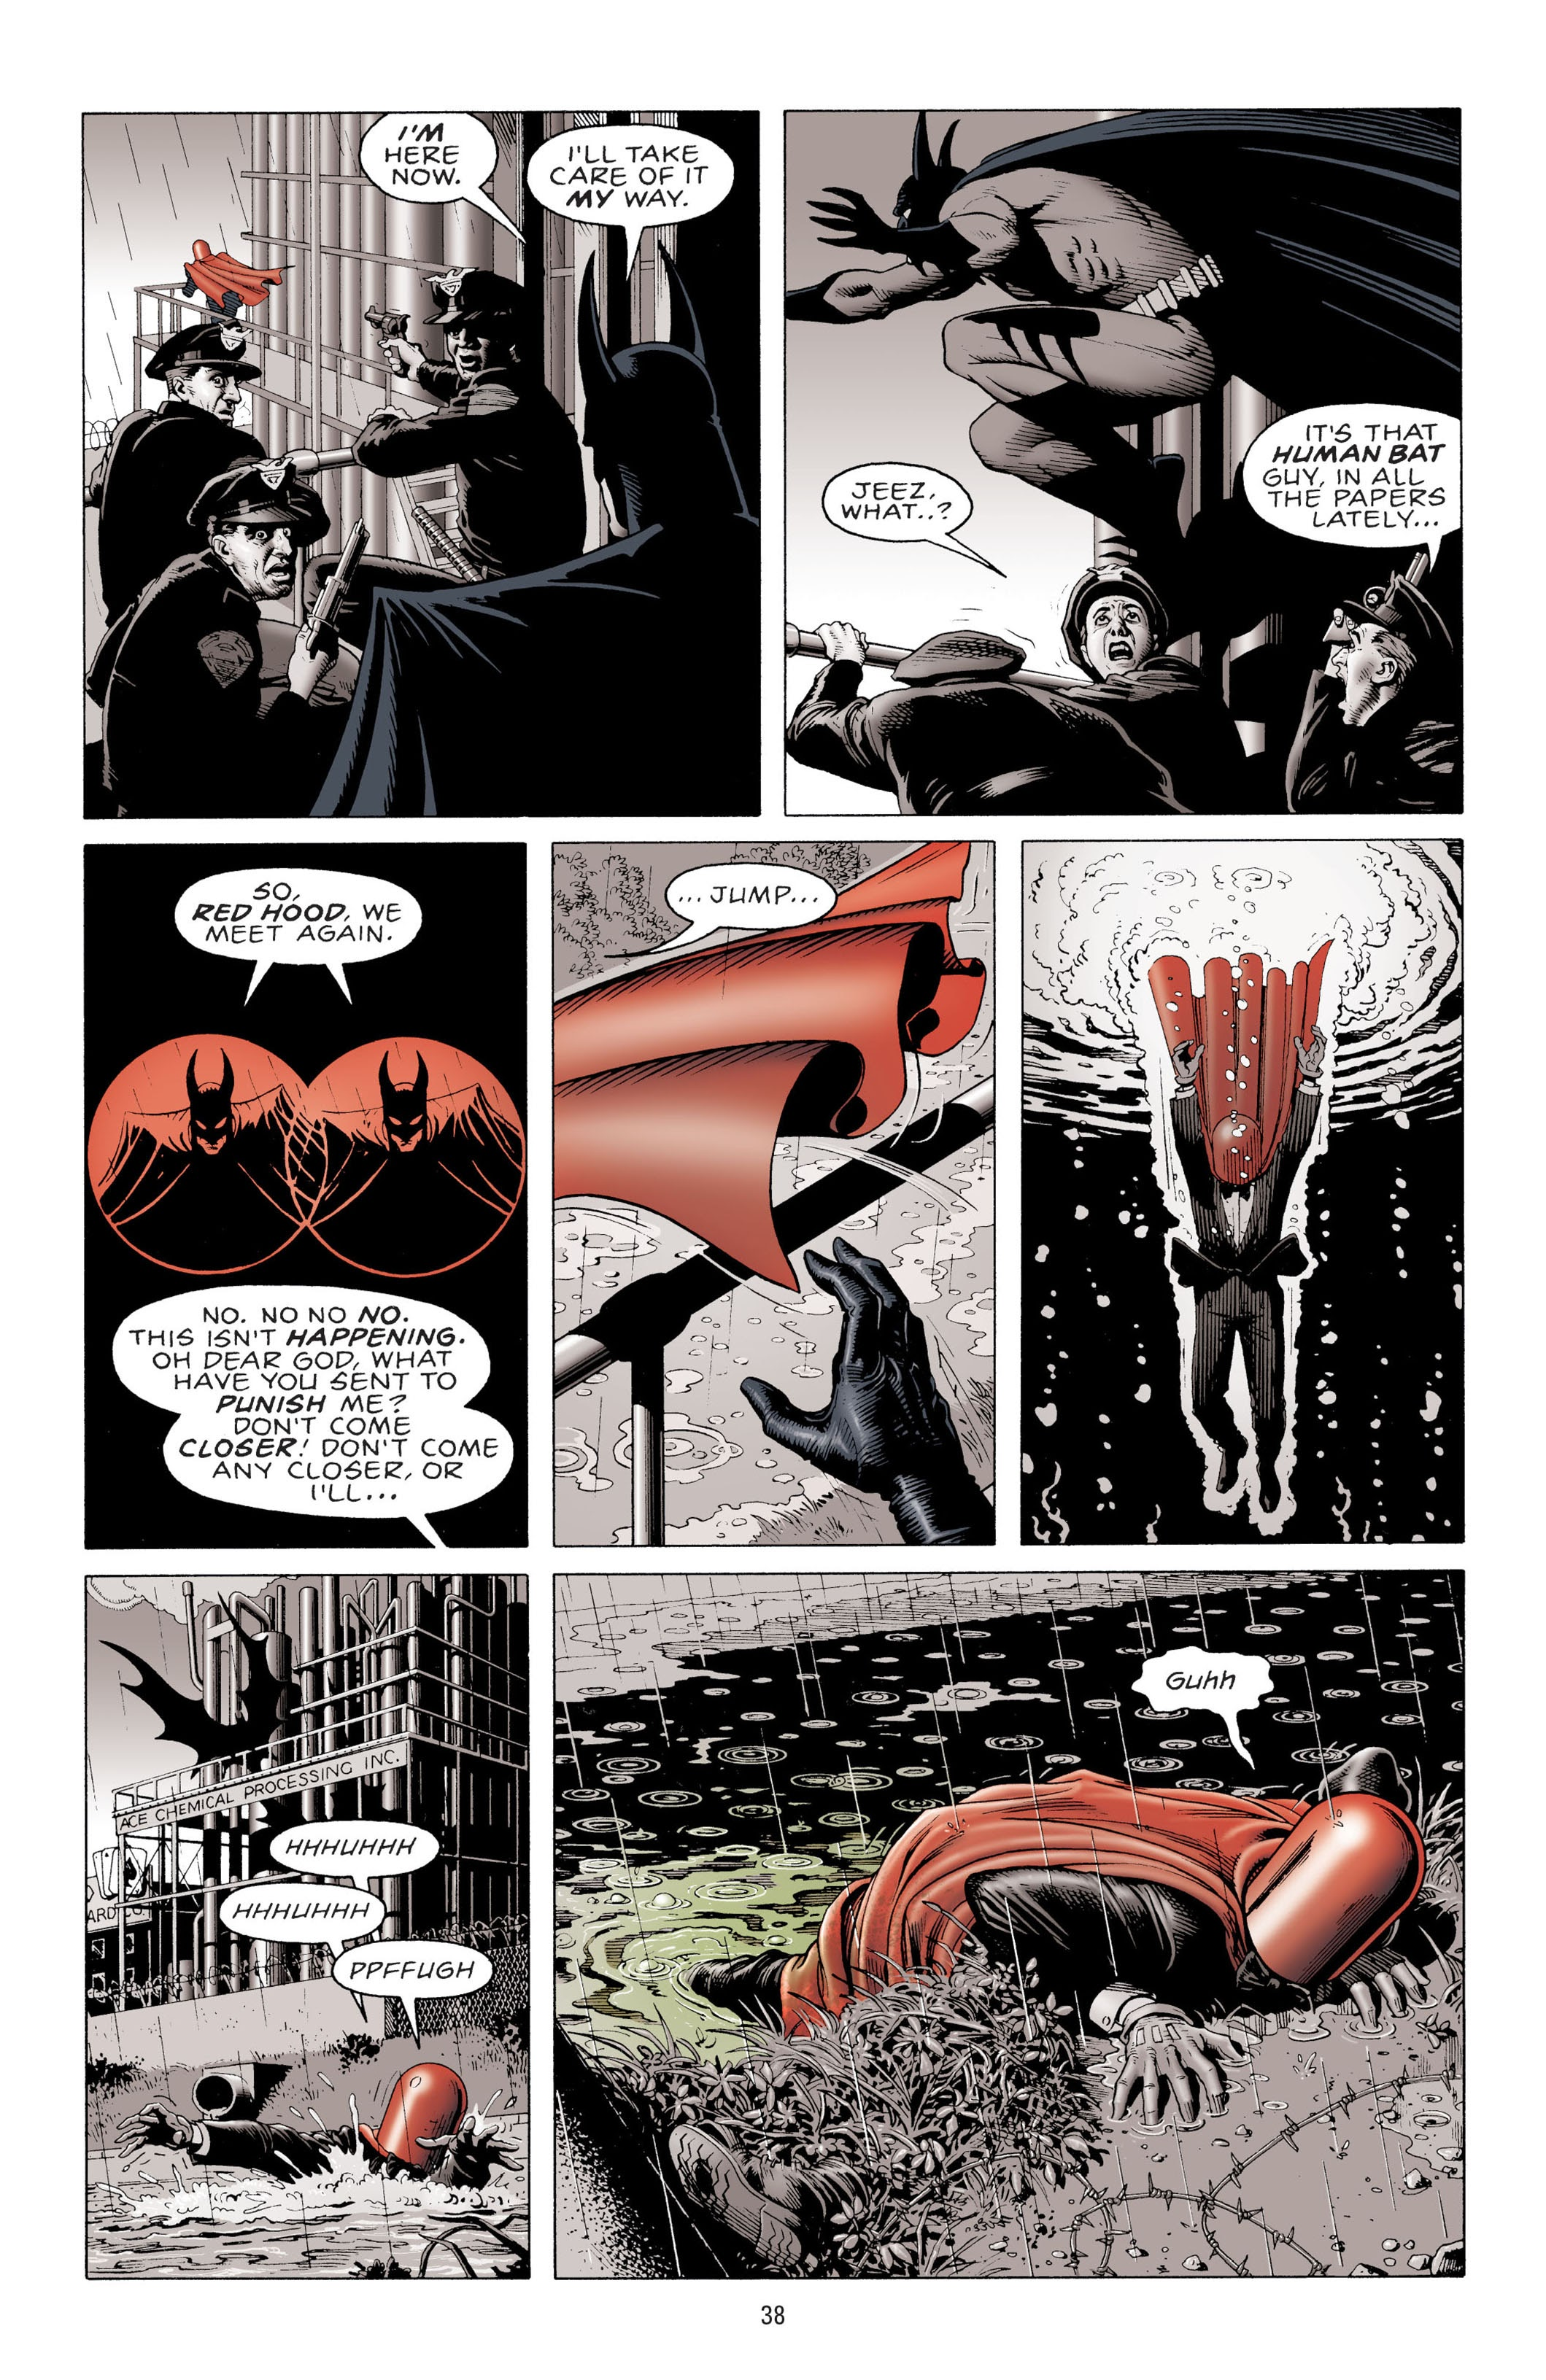 Psychology of Bruce Wayne JlckPkDm_vrCW3kPLk5SyWfNYFzIZUKjnxLBmnblEzgA9VSp8mcwYtSgCaiPVbRTIjnhAg7FrS4HT00mV3kEM7m8kNhQHbb8SGajB7W7Spgaim1qeG76xAiWG8xNVuSVNOAYBD5Kwg=s0